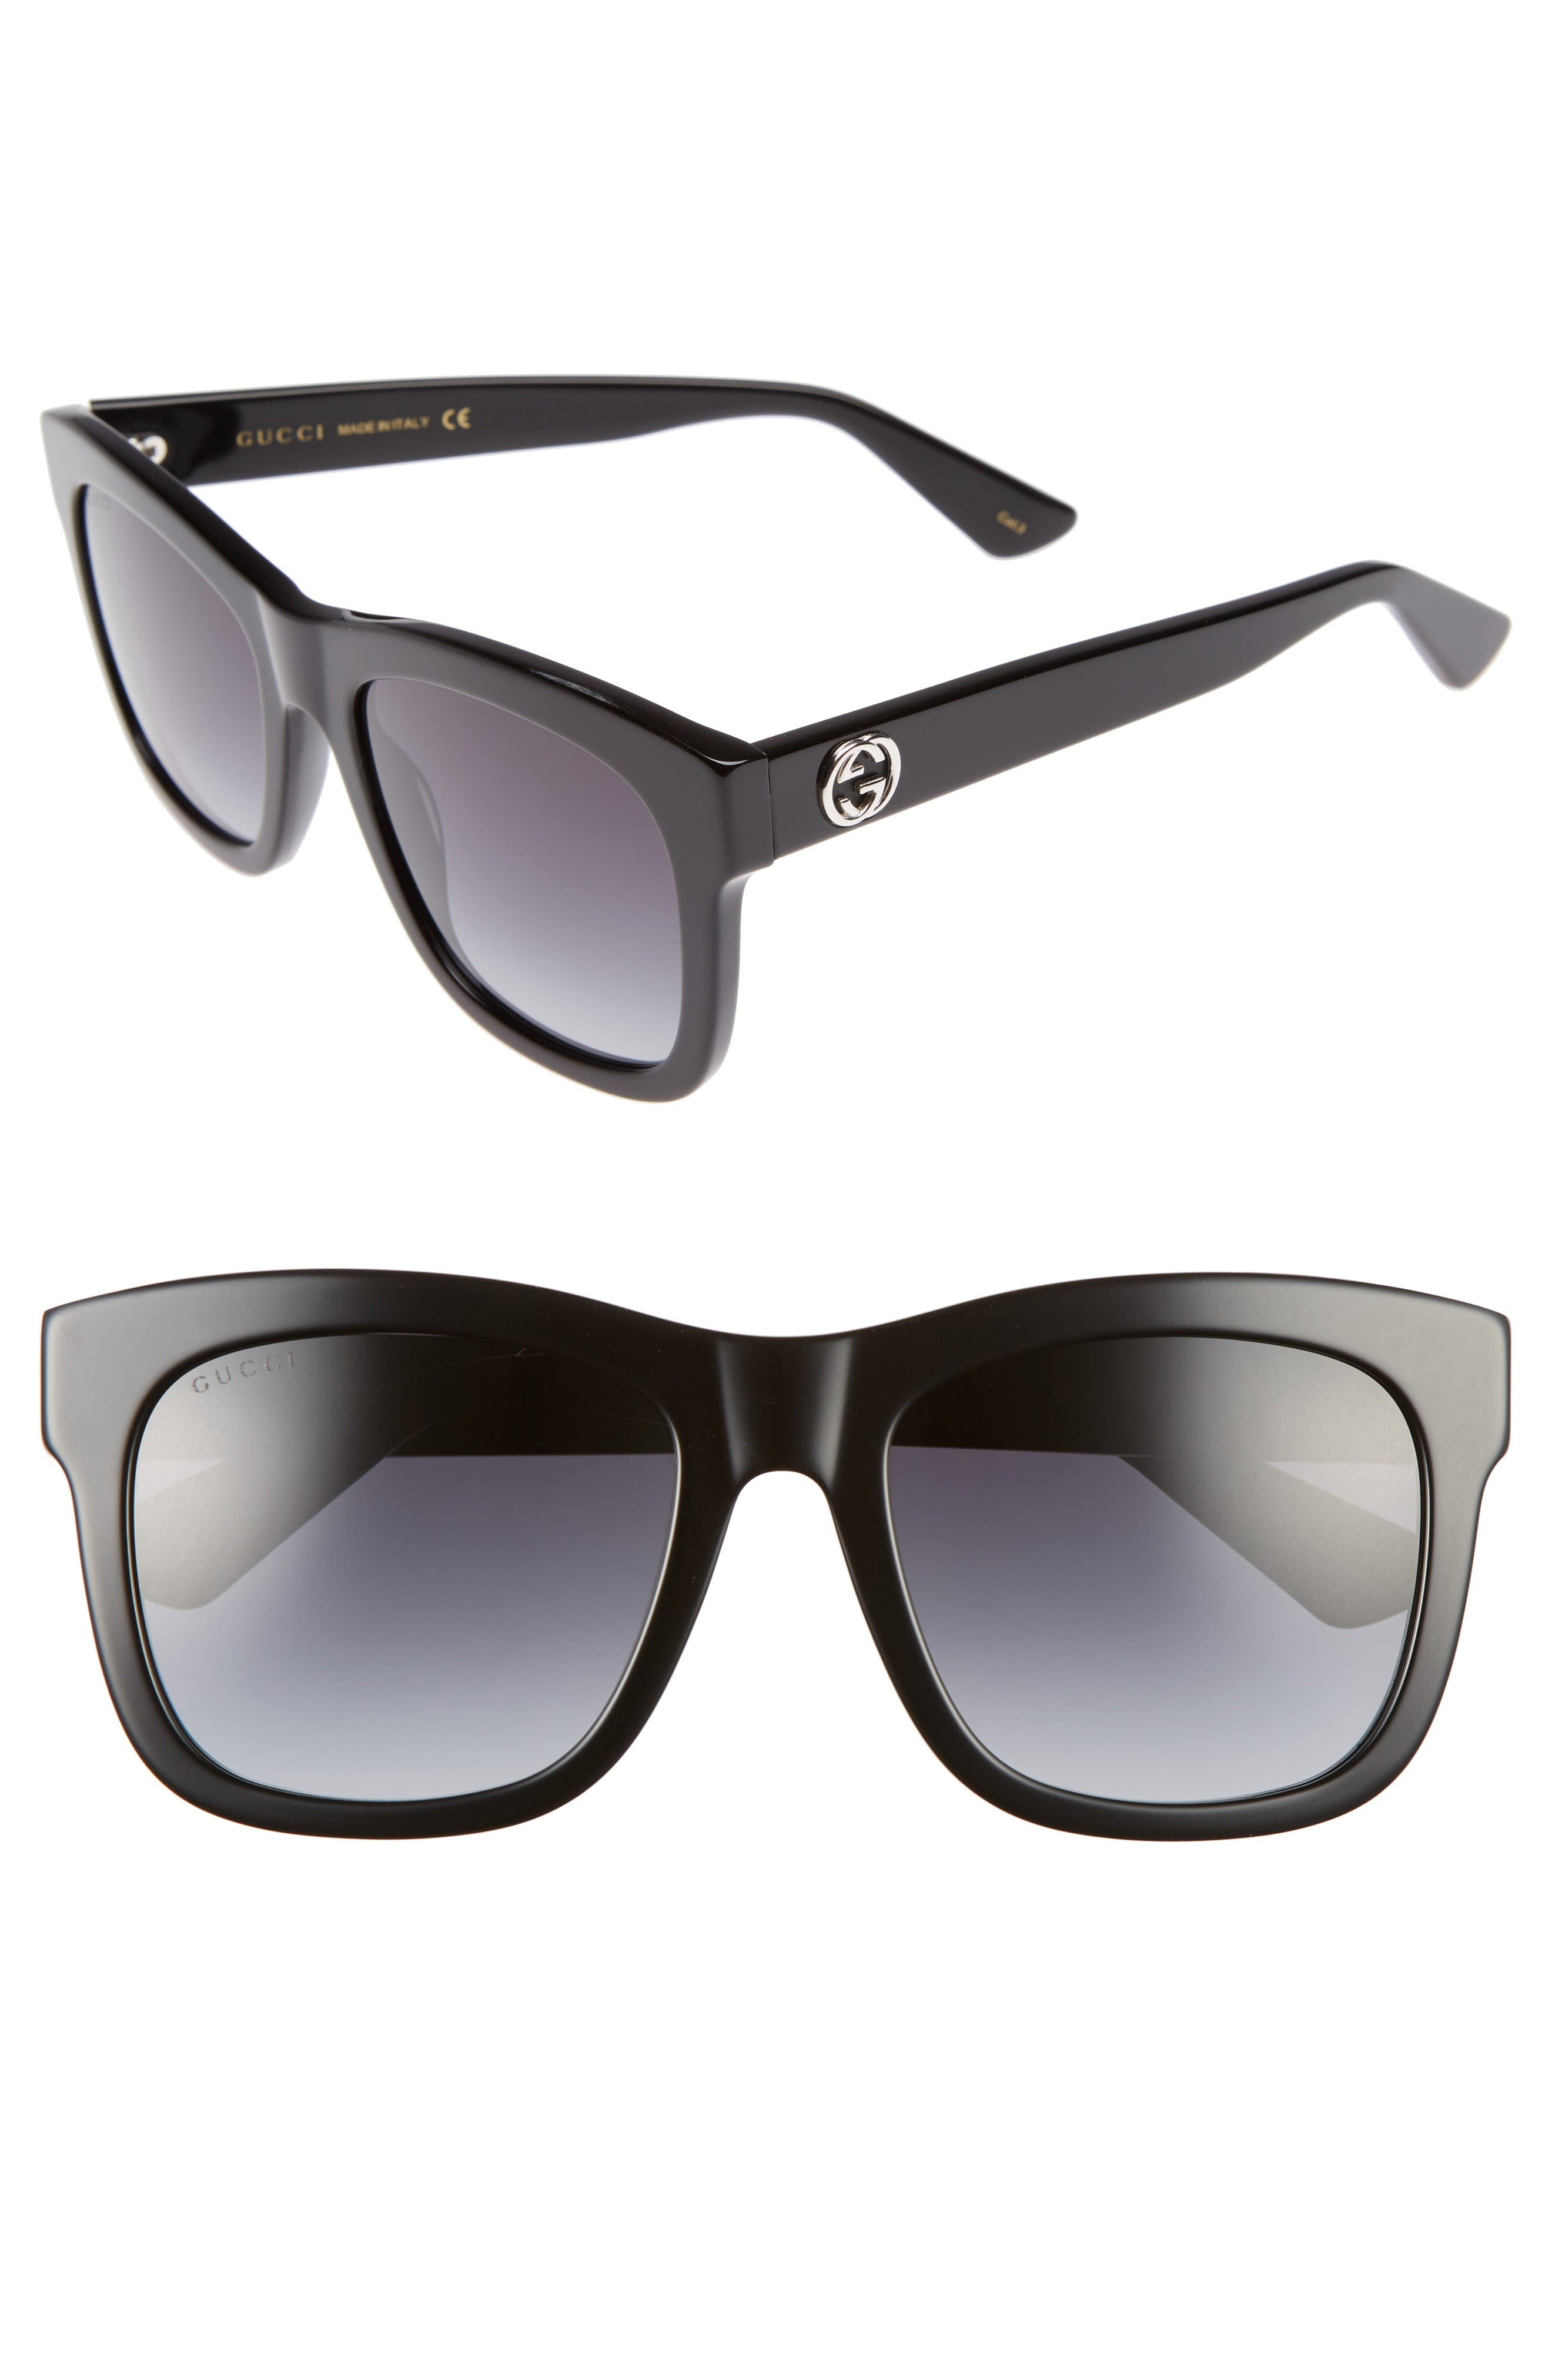 Alternate Image 1 Selected - Gucci 54mm Retro Sunglasses